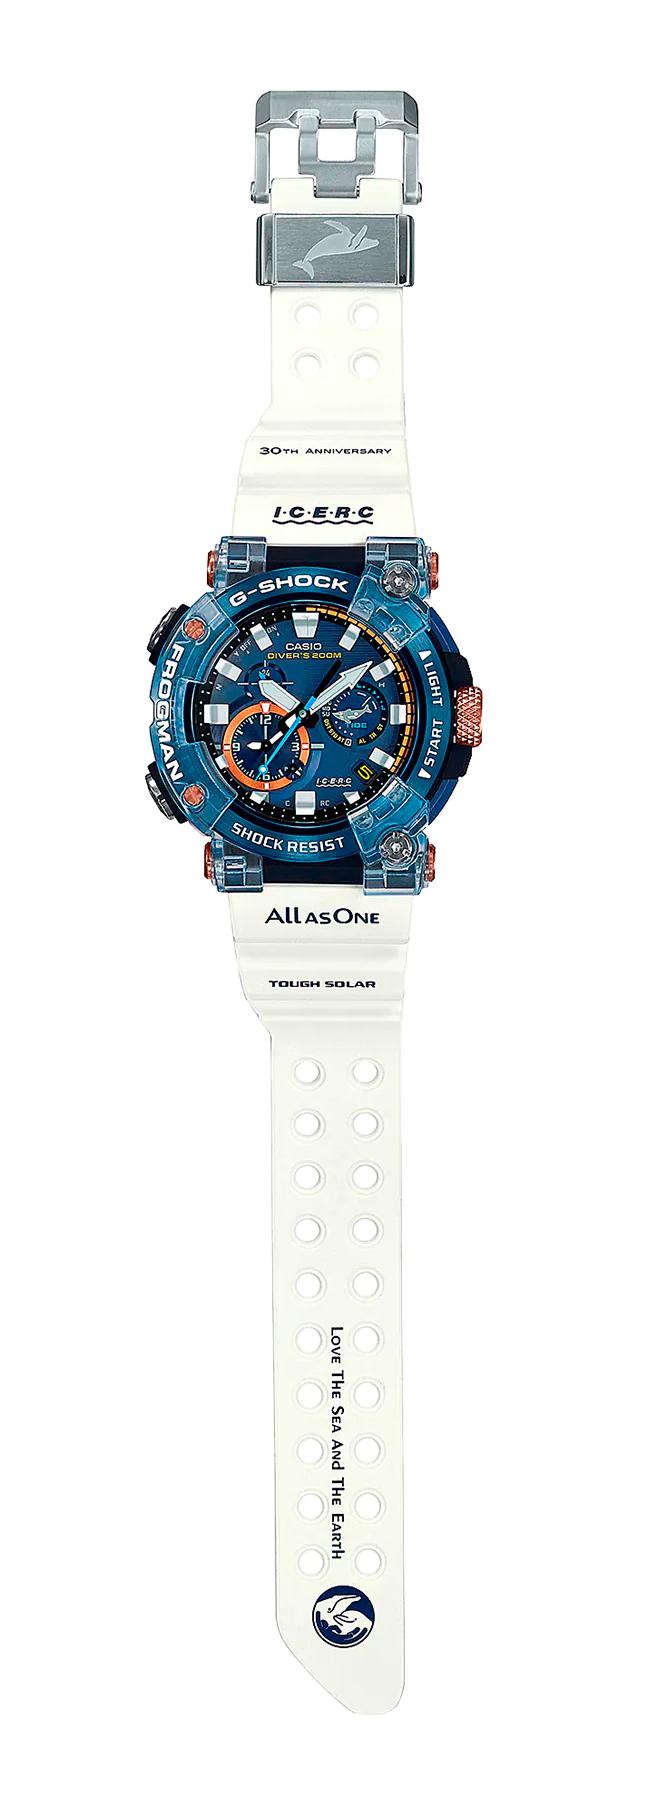 nuevo reloj divers frogman love icerc 2021 GWF-A1000K-2